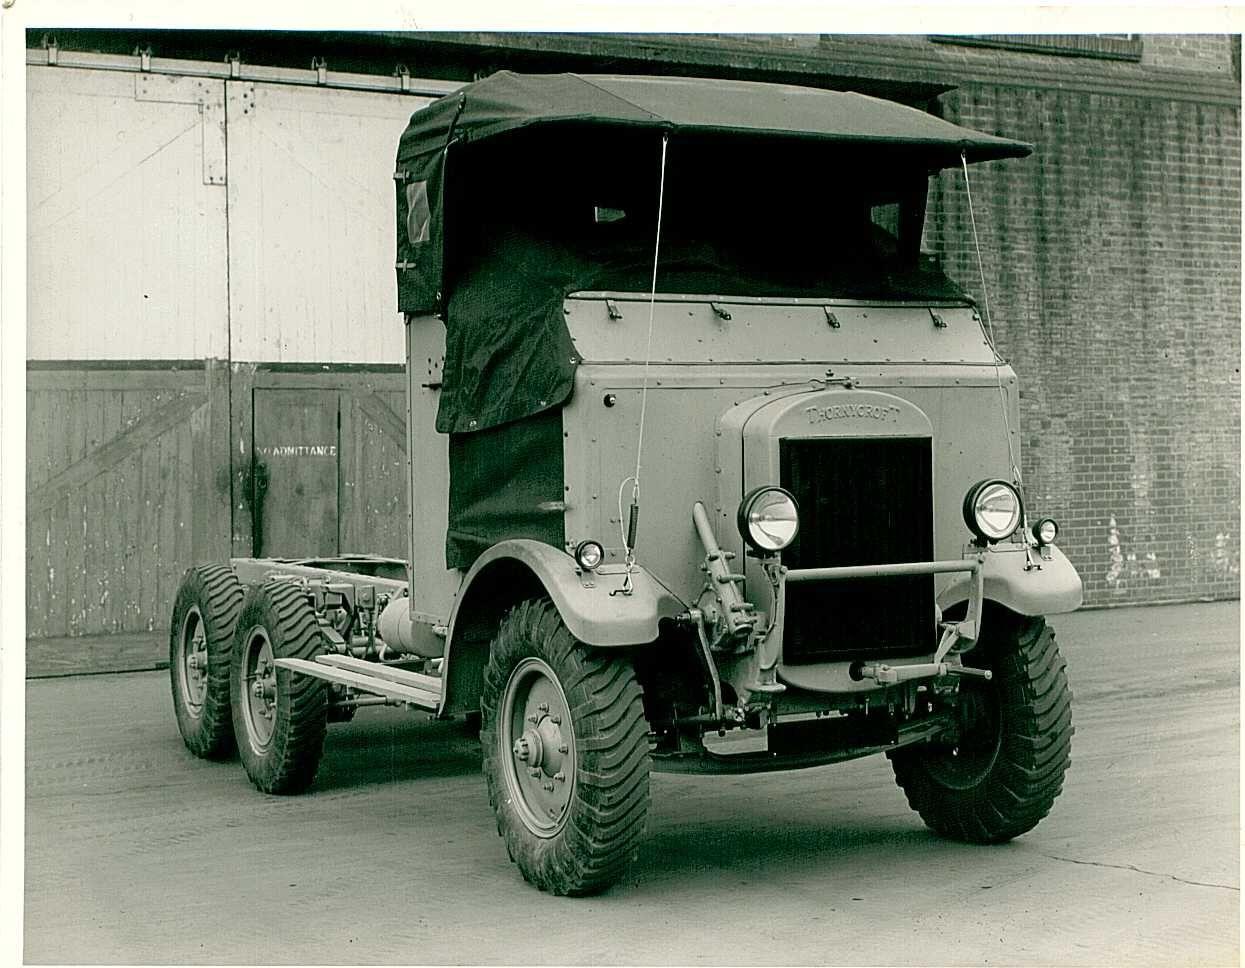 Mercedes benz 609 dump trucks for sale tipper truck dumper tipper - 1952 Commer Ts3 Brs Truck Via Flickr Old British Lorries Pinterest Trucks